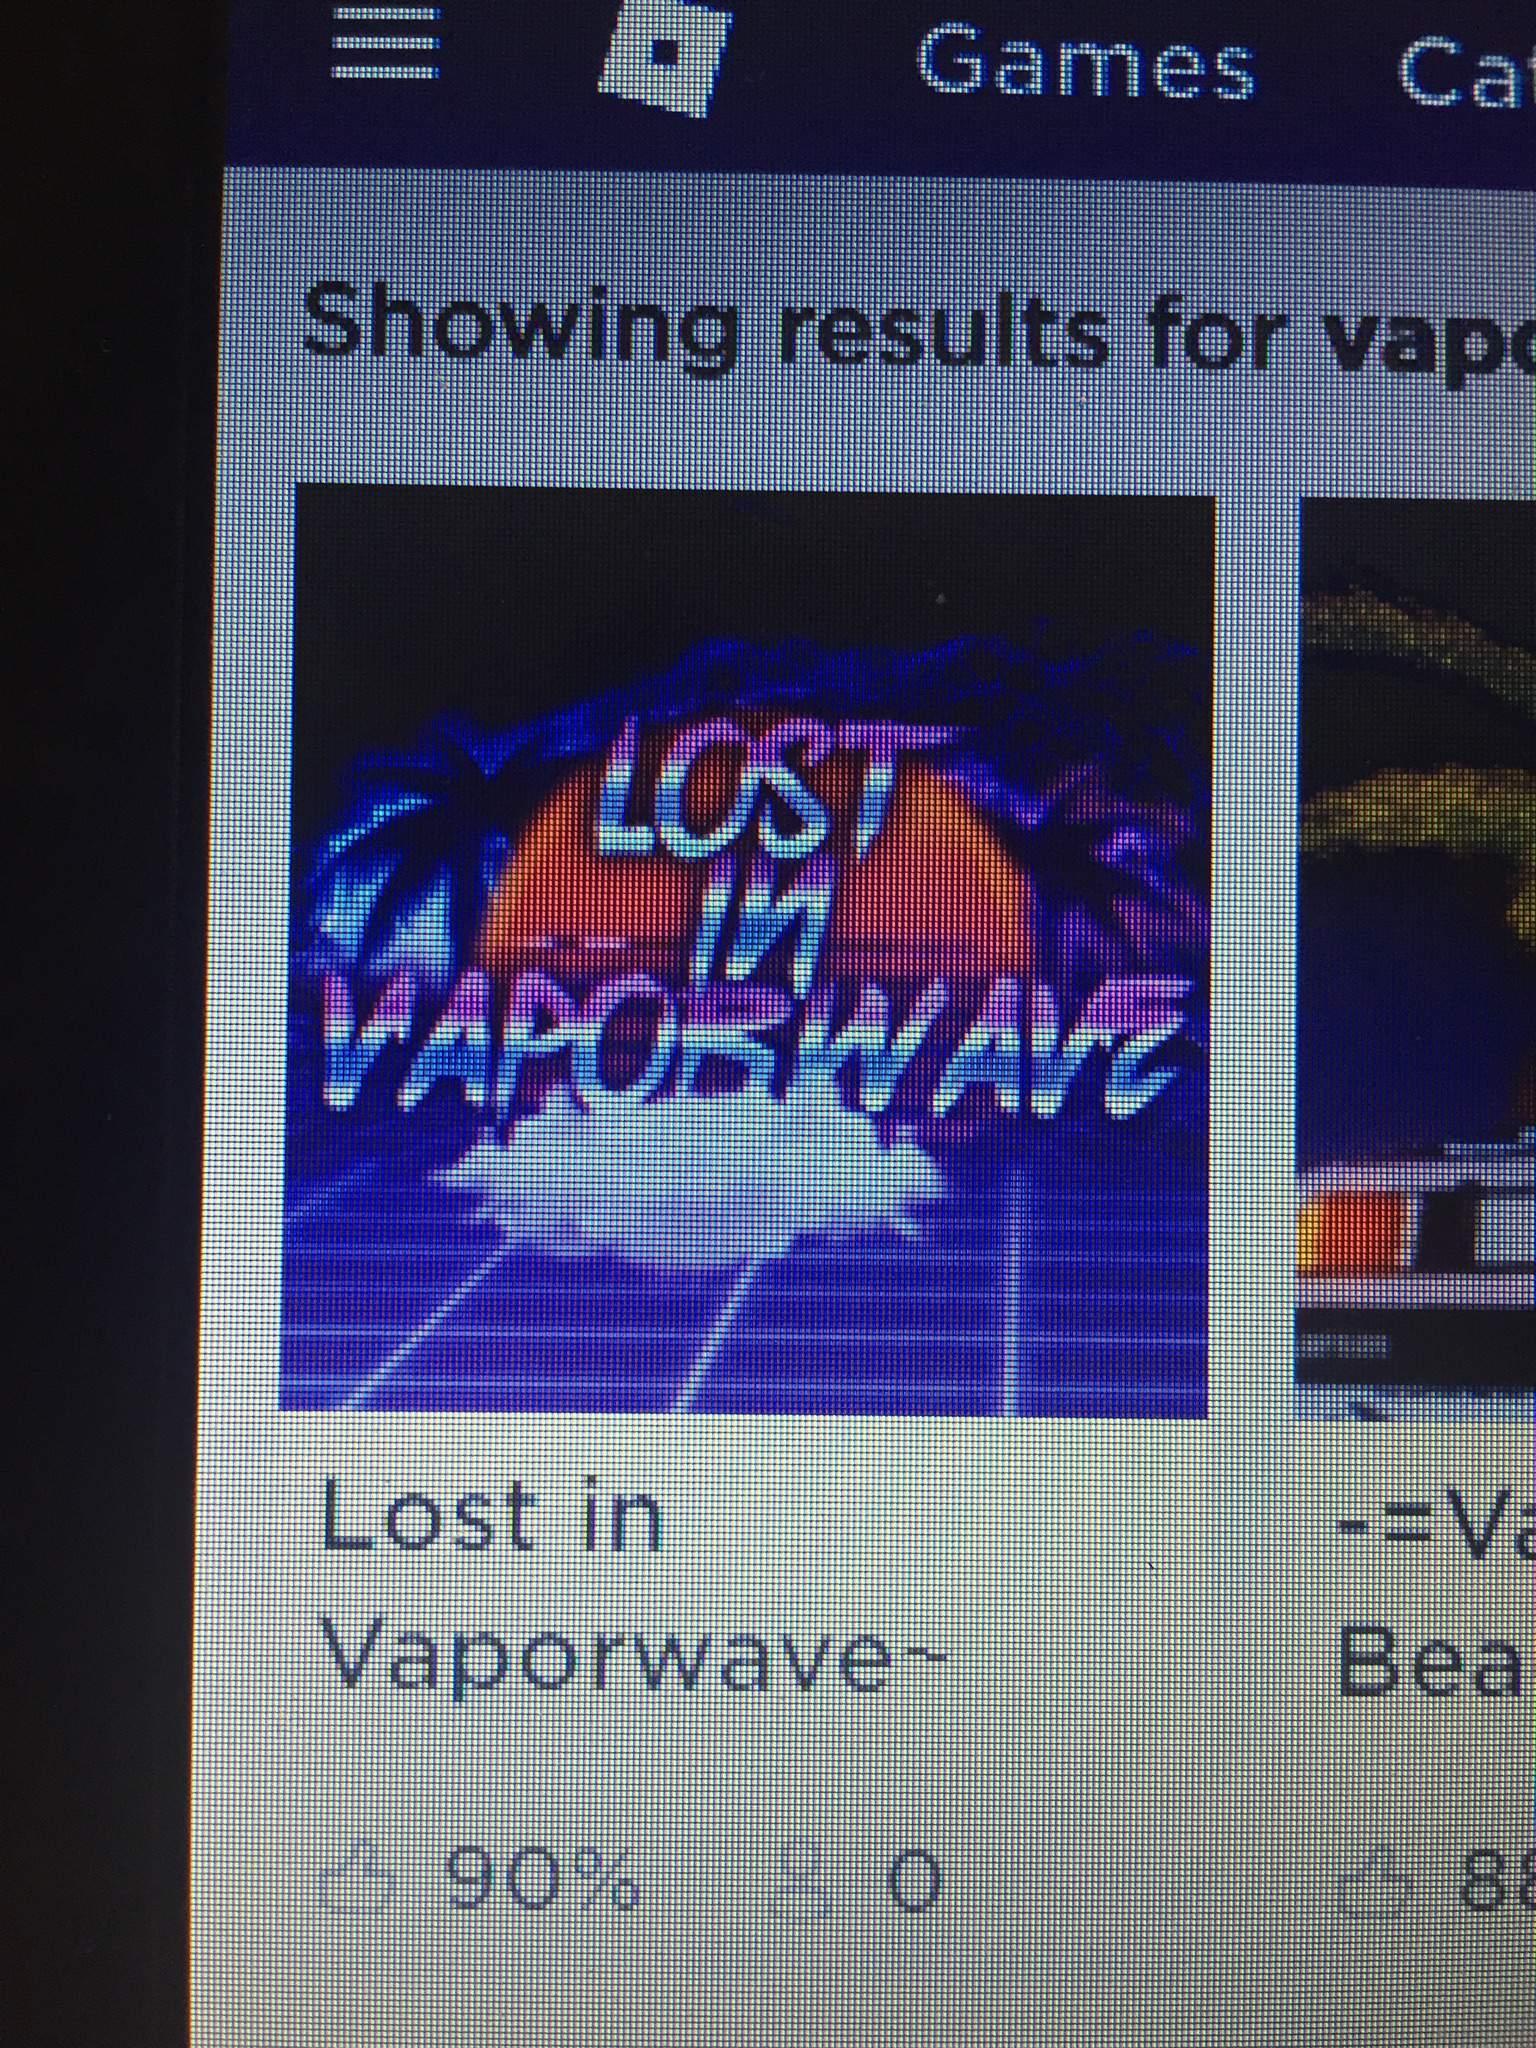 Roblox Vaporwave Music Id